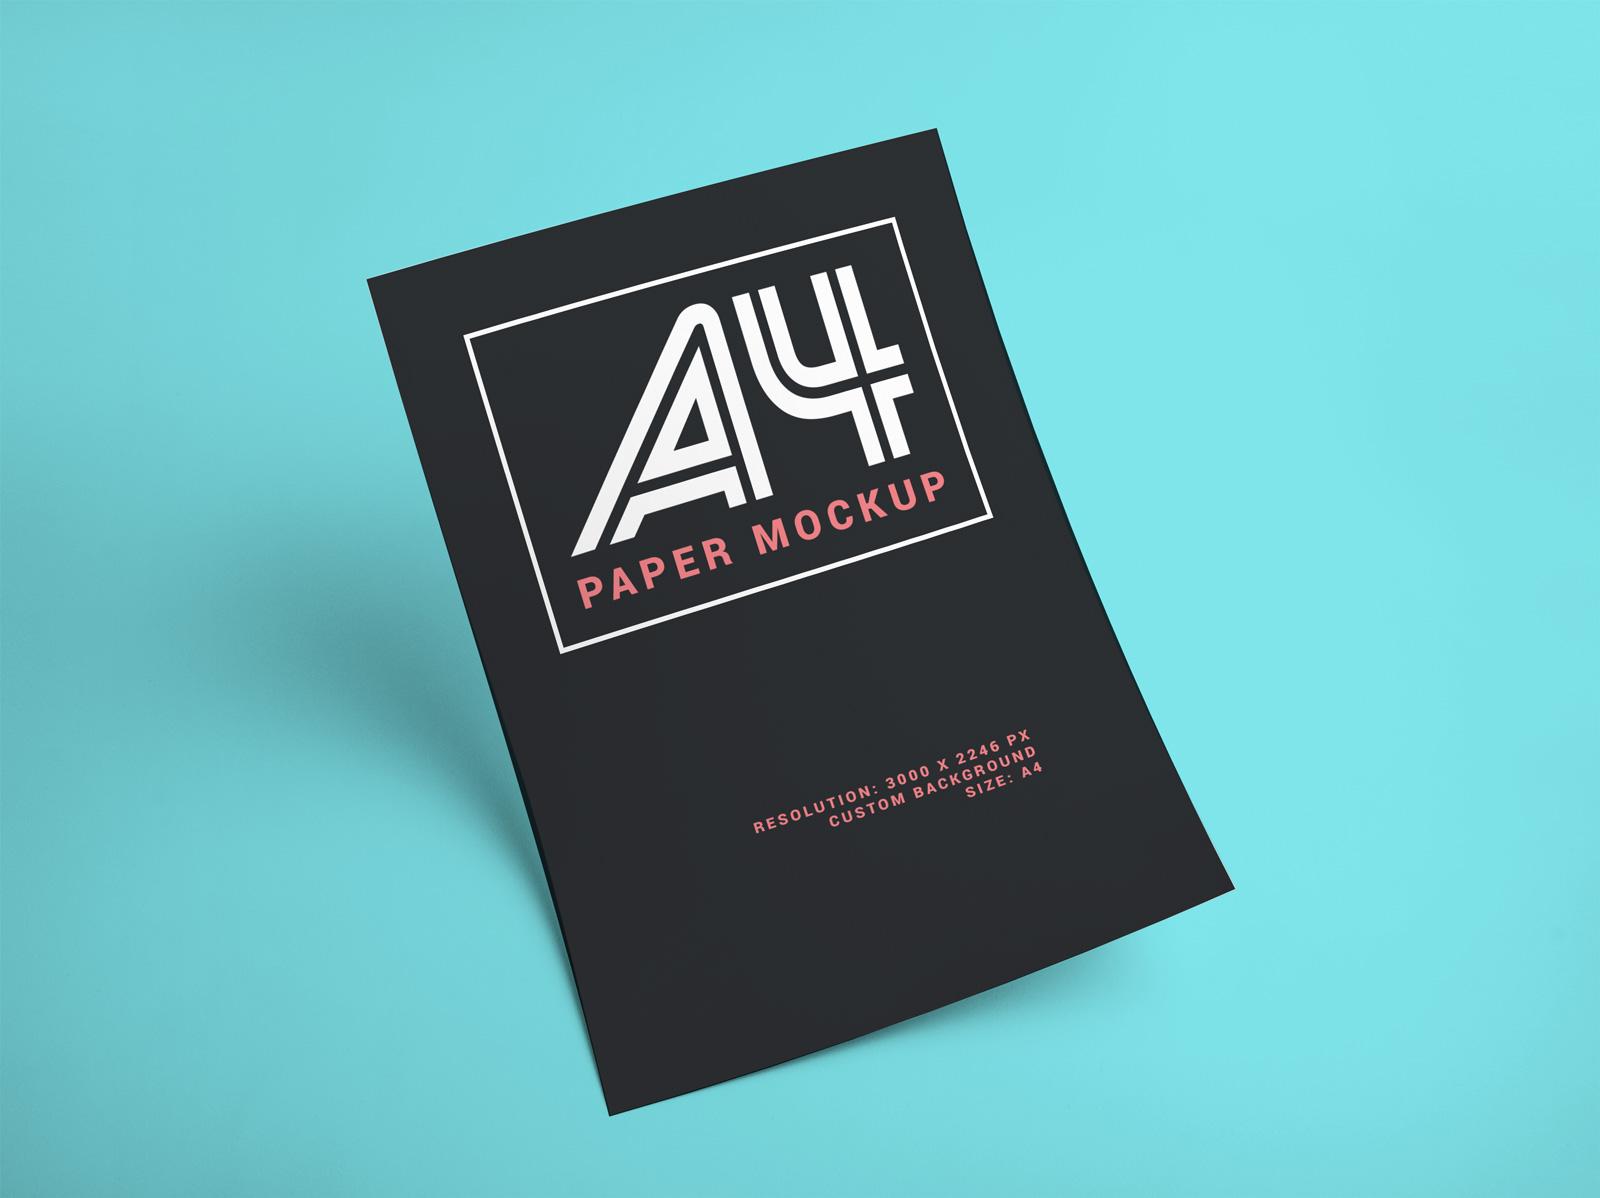 Free-A4-Paper-Mockup-PSD-2